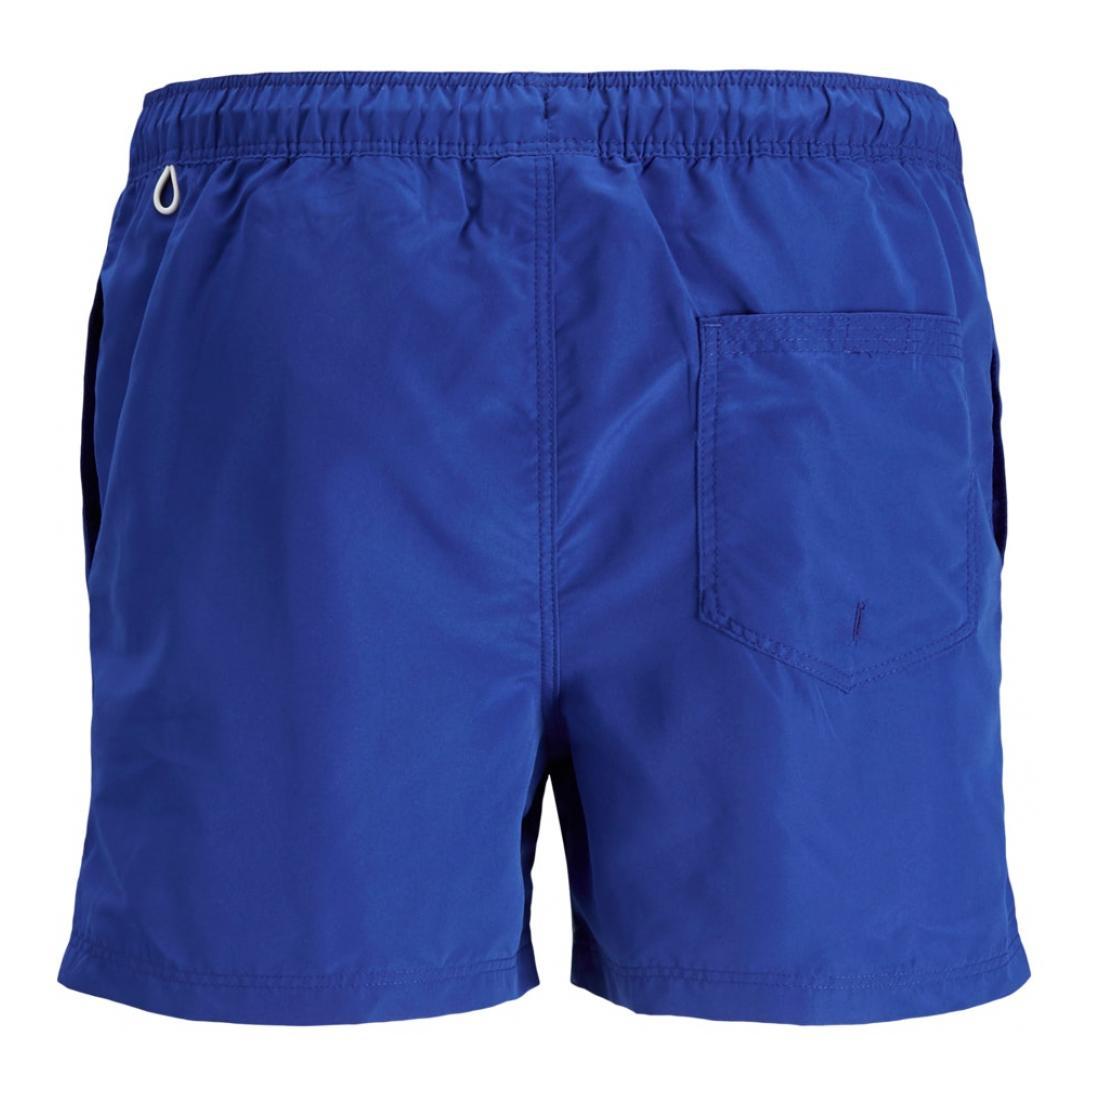 Jack & Jones Bermuda/Shorts Herren JJIARUBA JJSWIM SHORTS AK